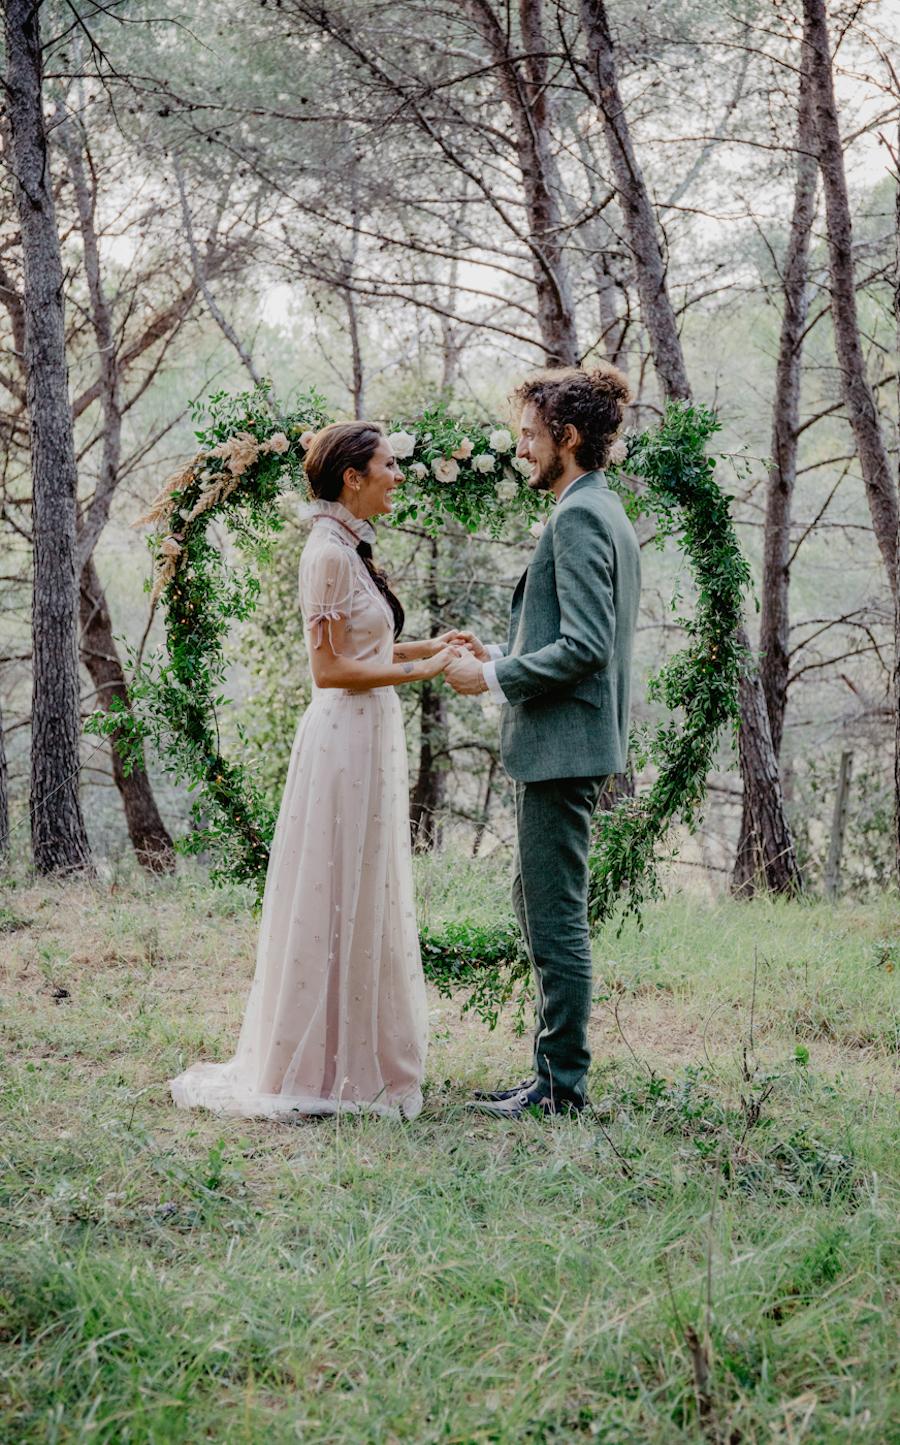 matrimonio-a-tema-stelle-in-pineta-federica-cosentino-12.jpg